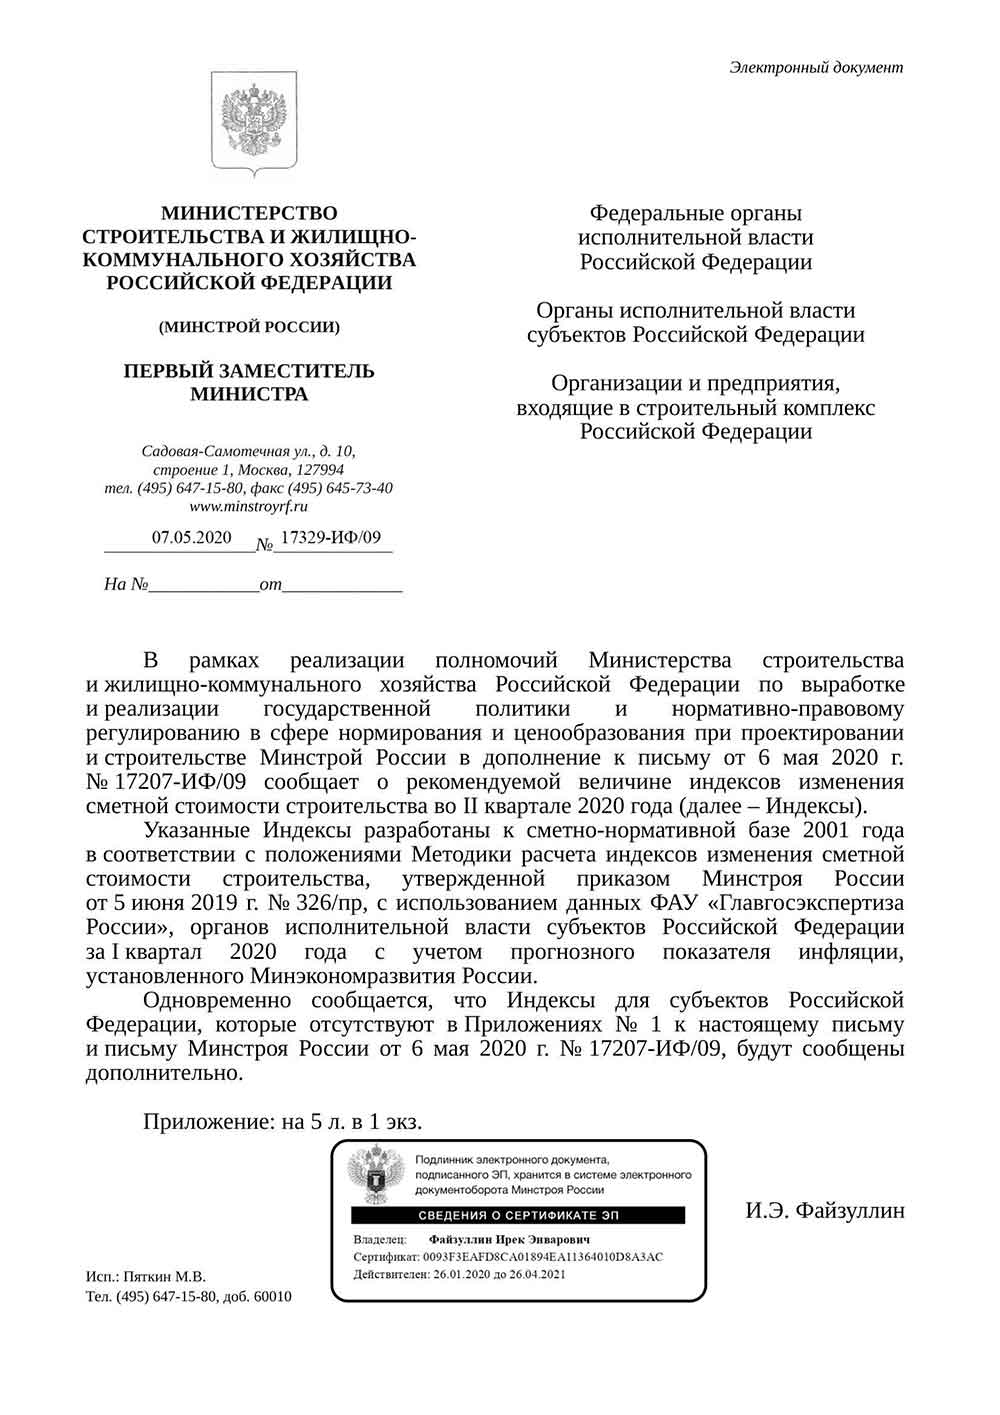 Письмо Минстроя РФ №17329-ИФ/09 от 07.05.2020 г.